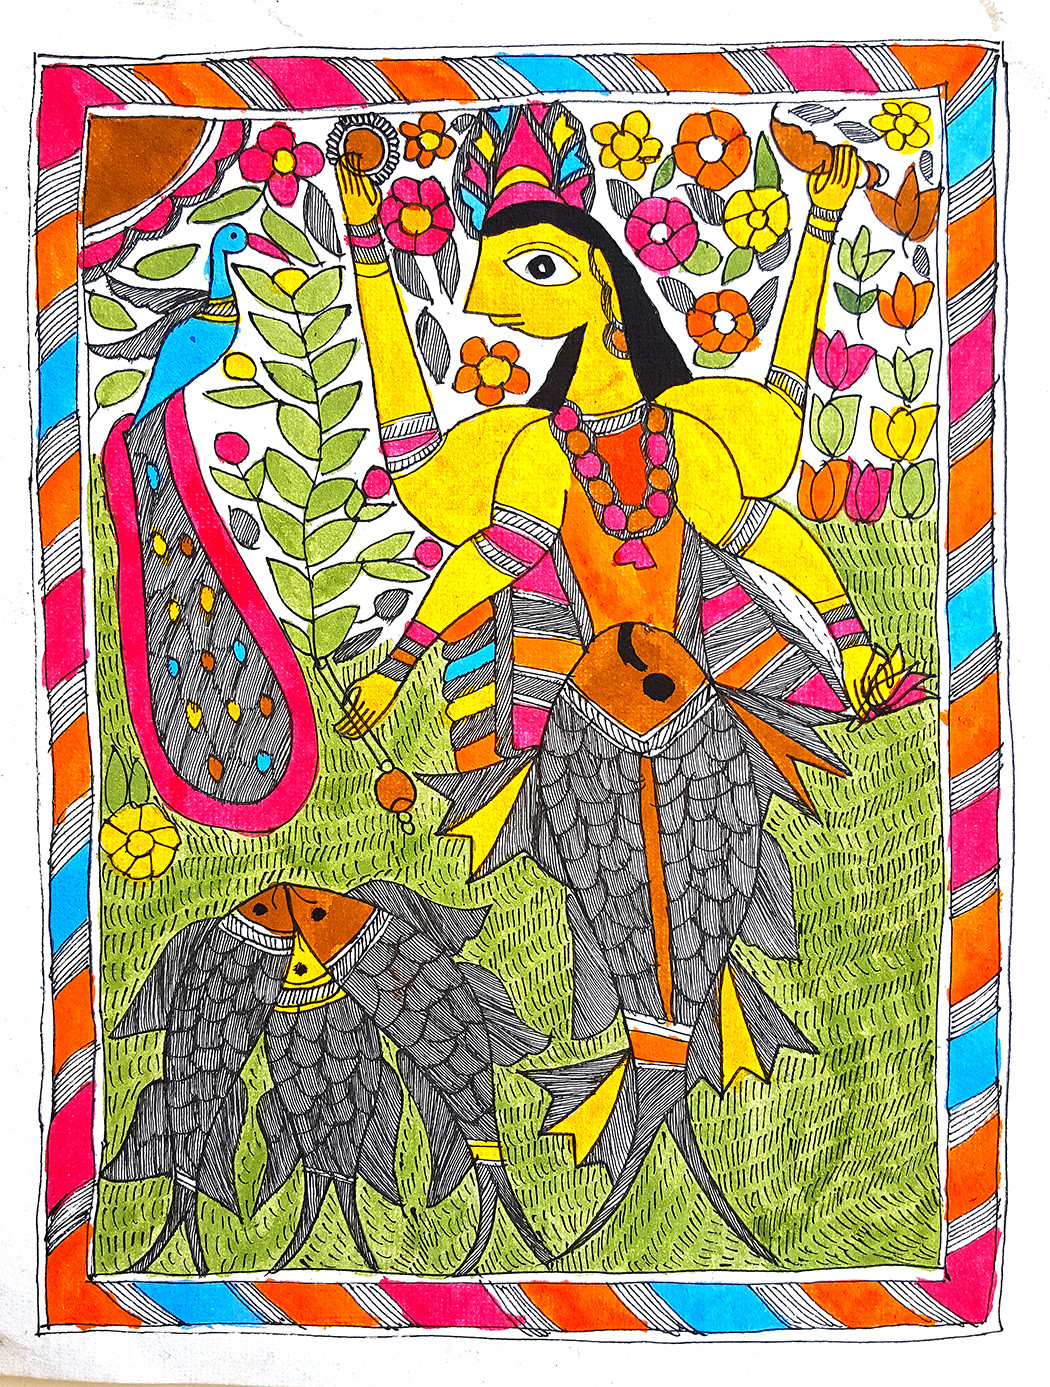 Matsya Avatar by Rainu Devi, Folk Painting, Earth pigments on handmade paper,